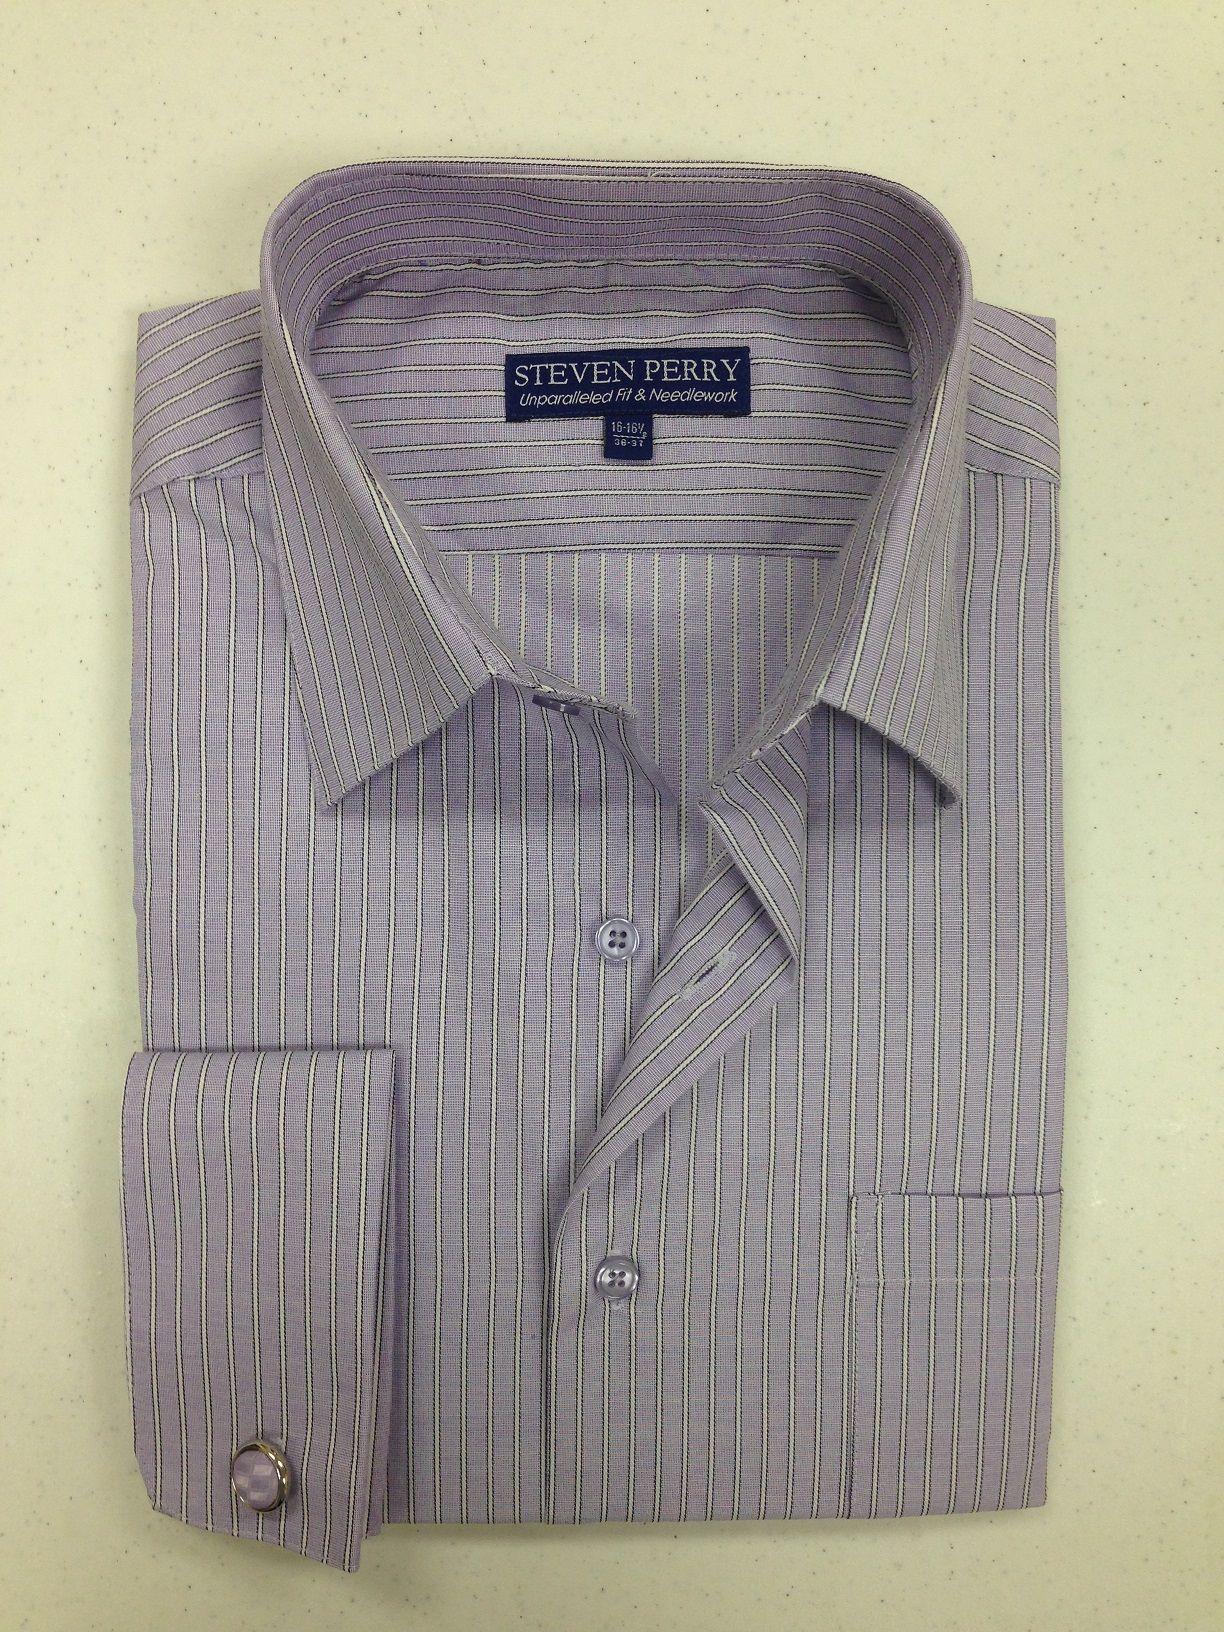 Steven Perry Woven Designer Shirt - Purple Stripes FREE CUFFLINKS